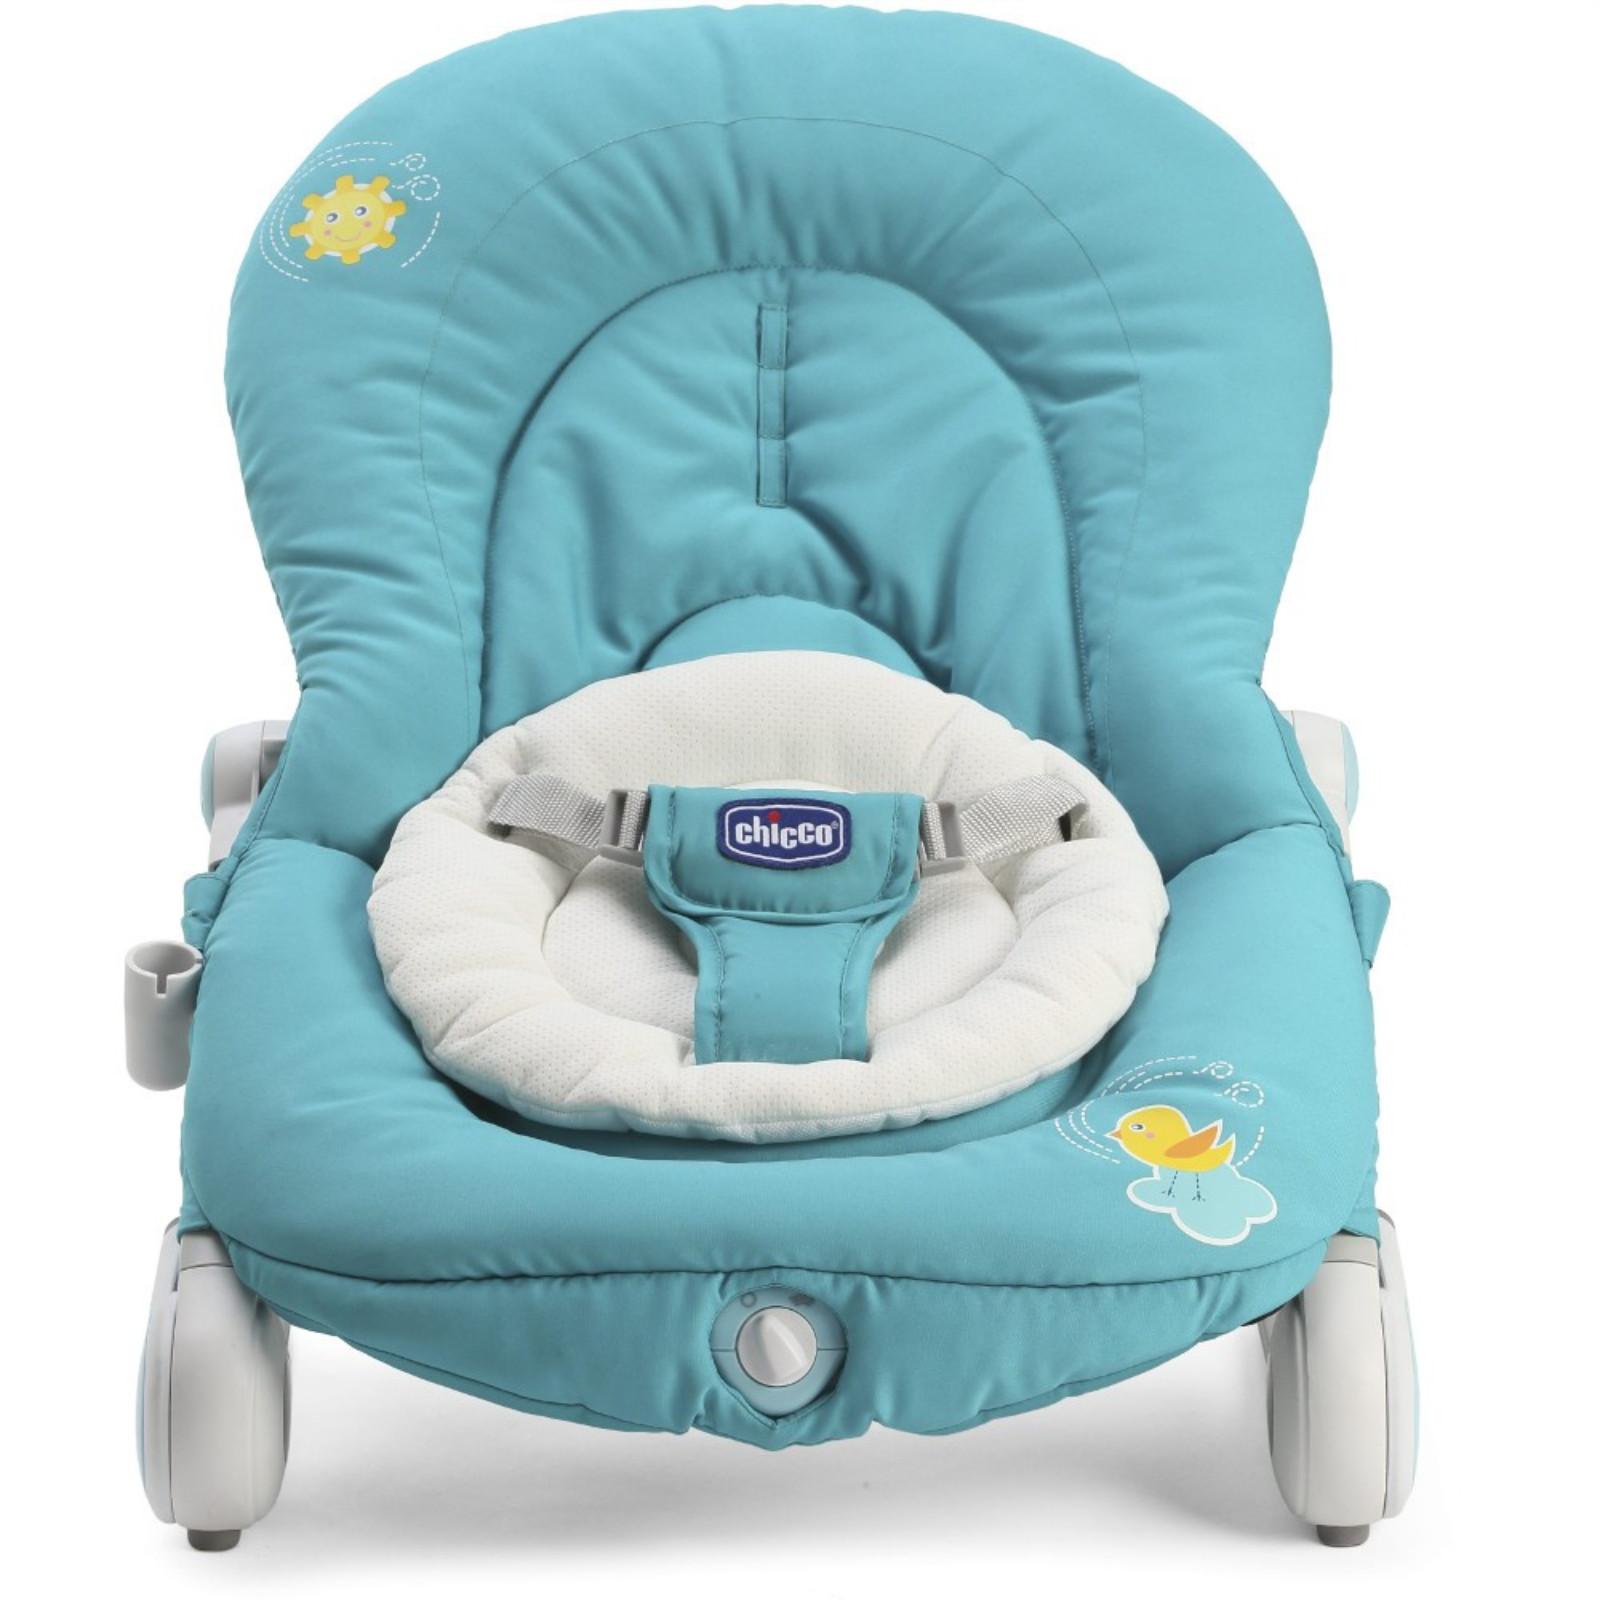 New Chicco Balloon Bouncer Turquoise Adjustable Baby